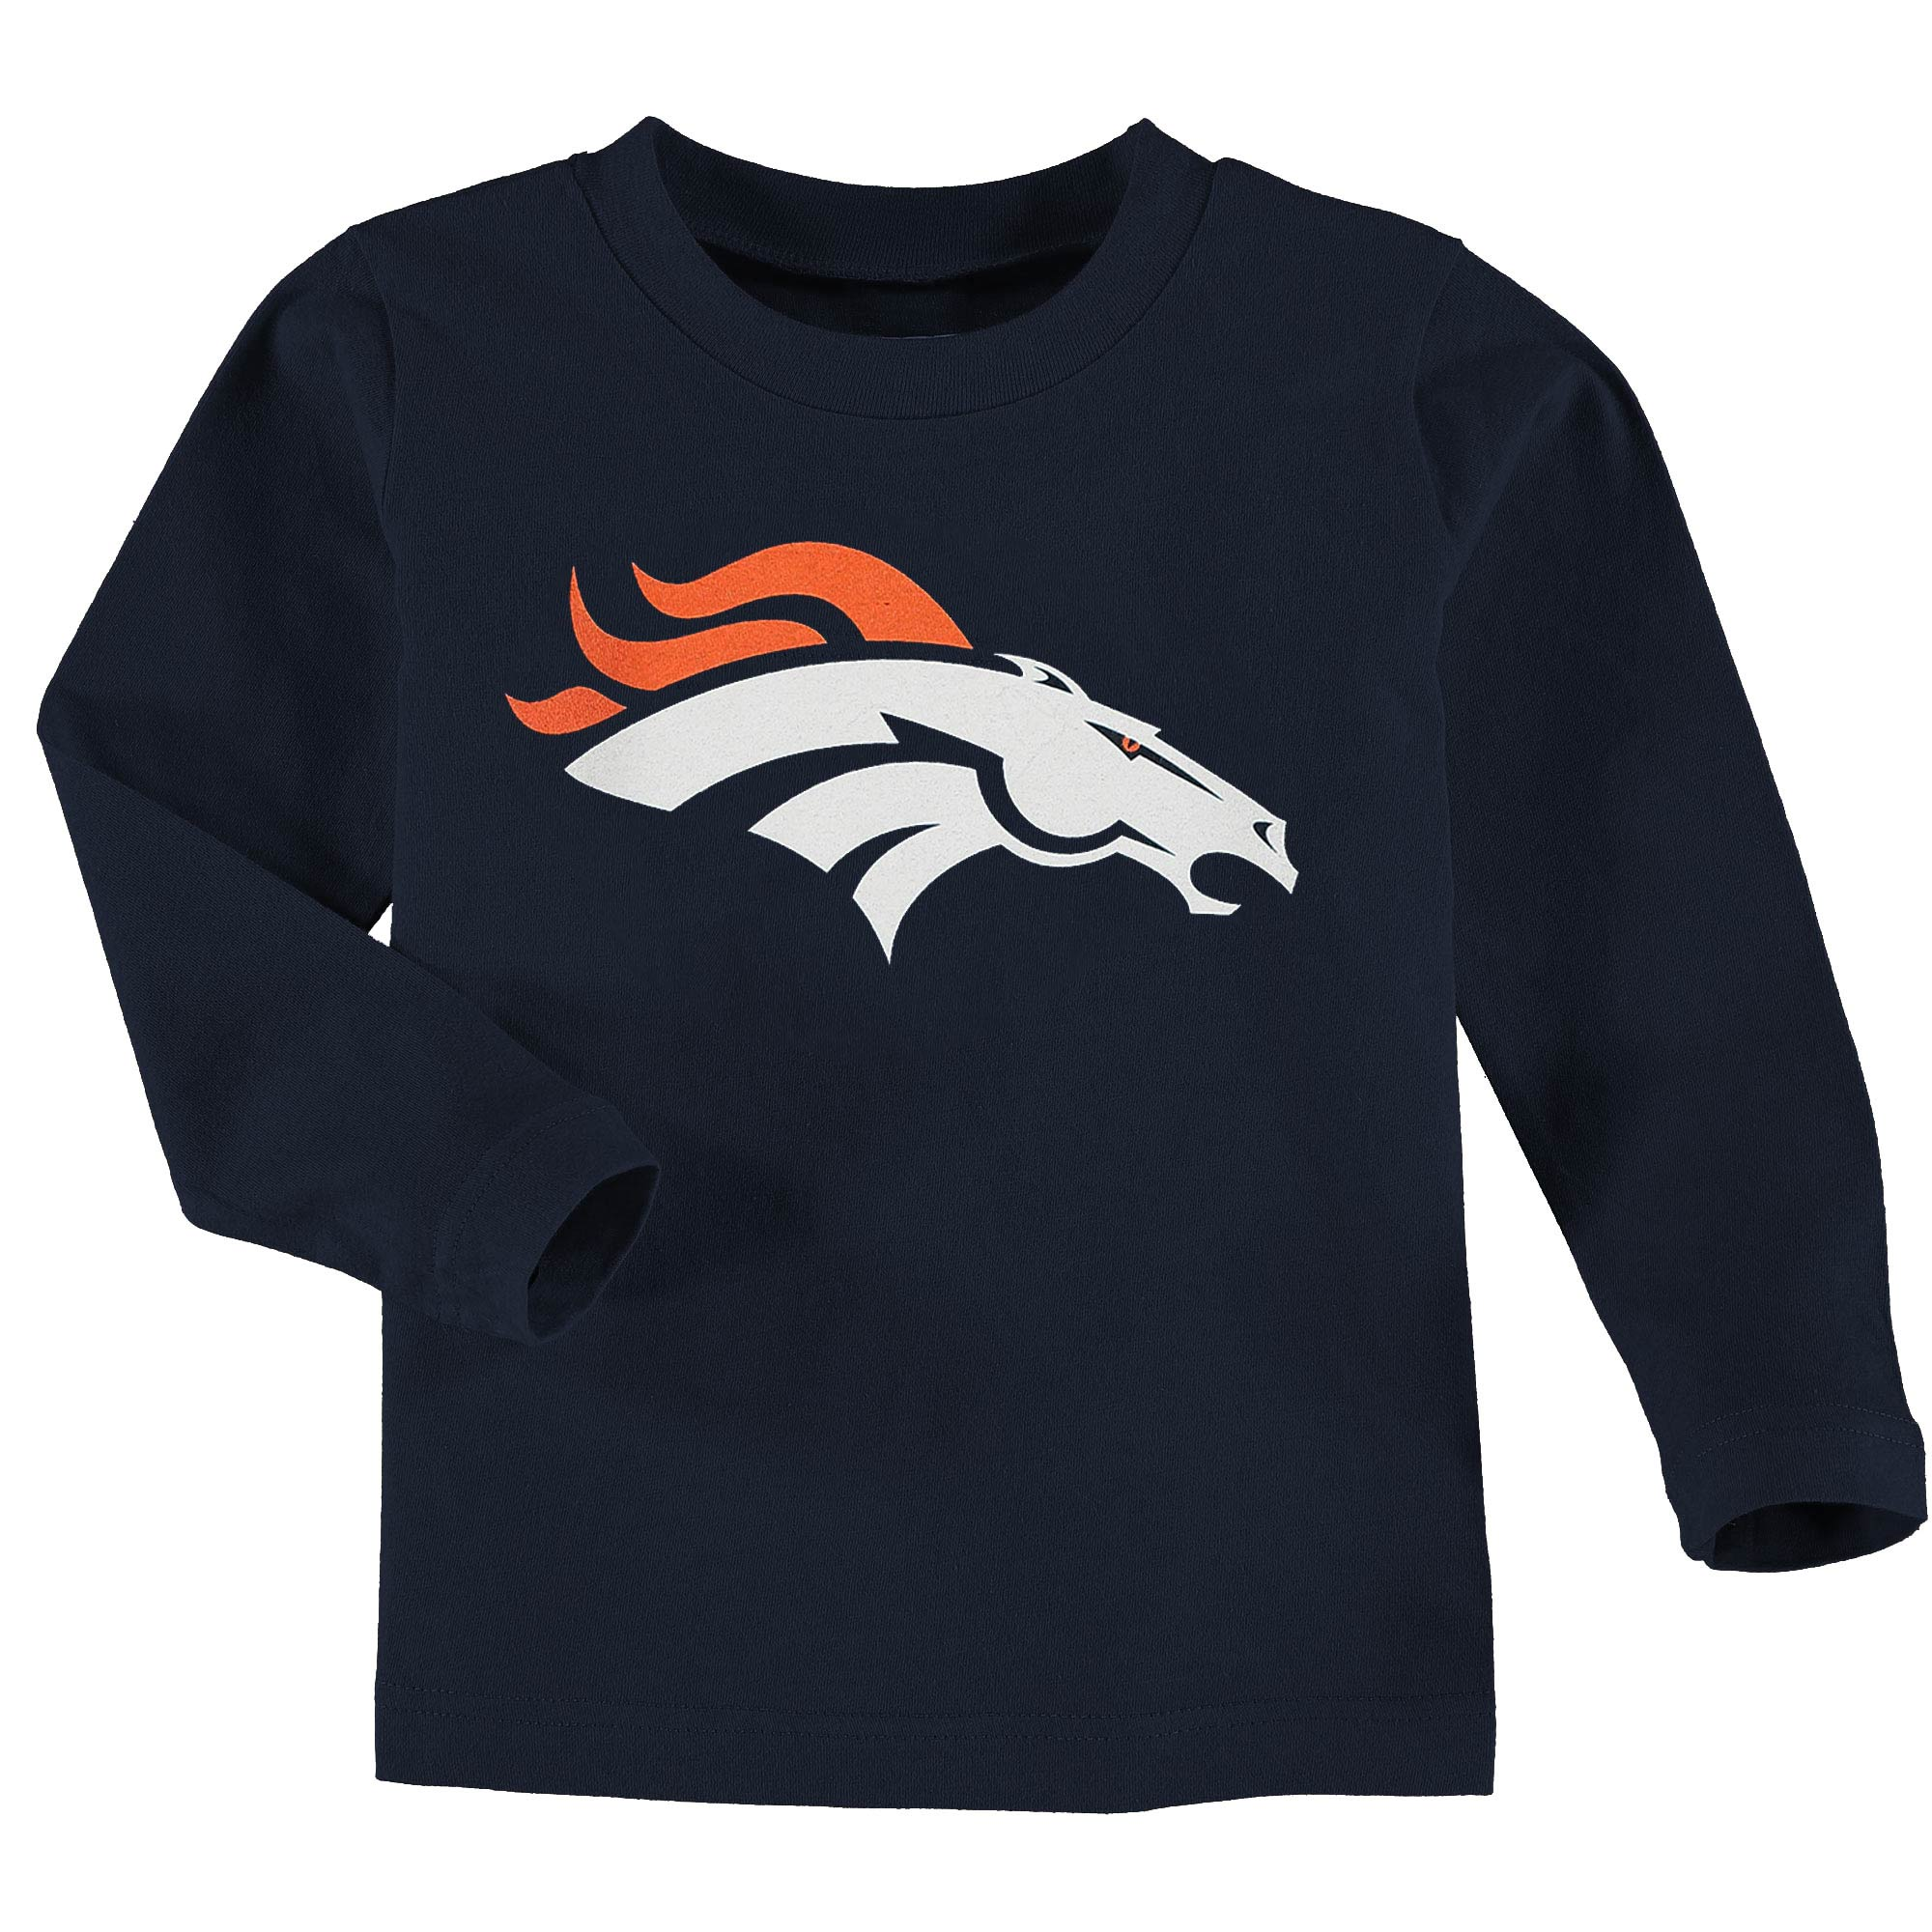 Toddler Team Logo Long Sleeve T-Shirt - Navy  ---